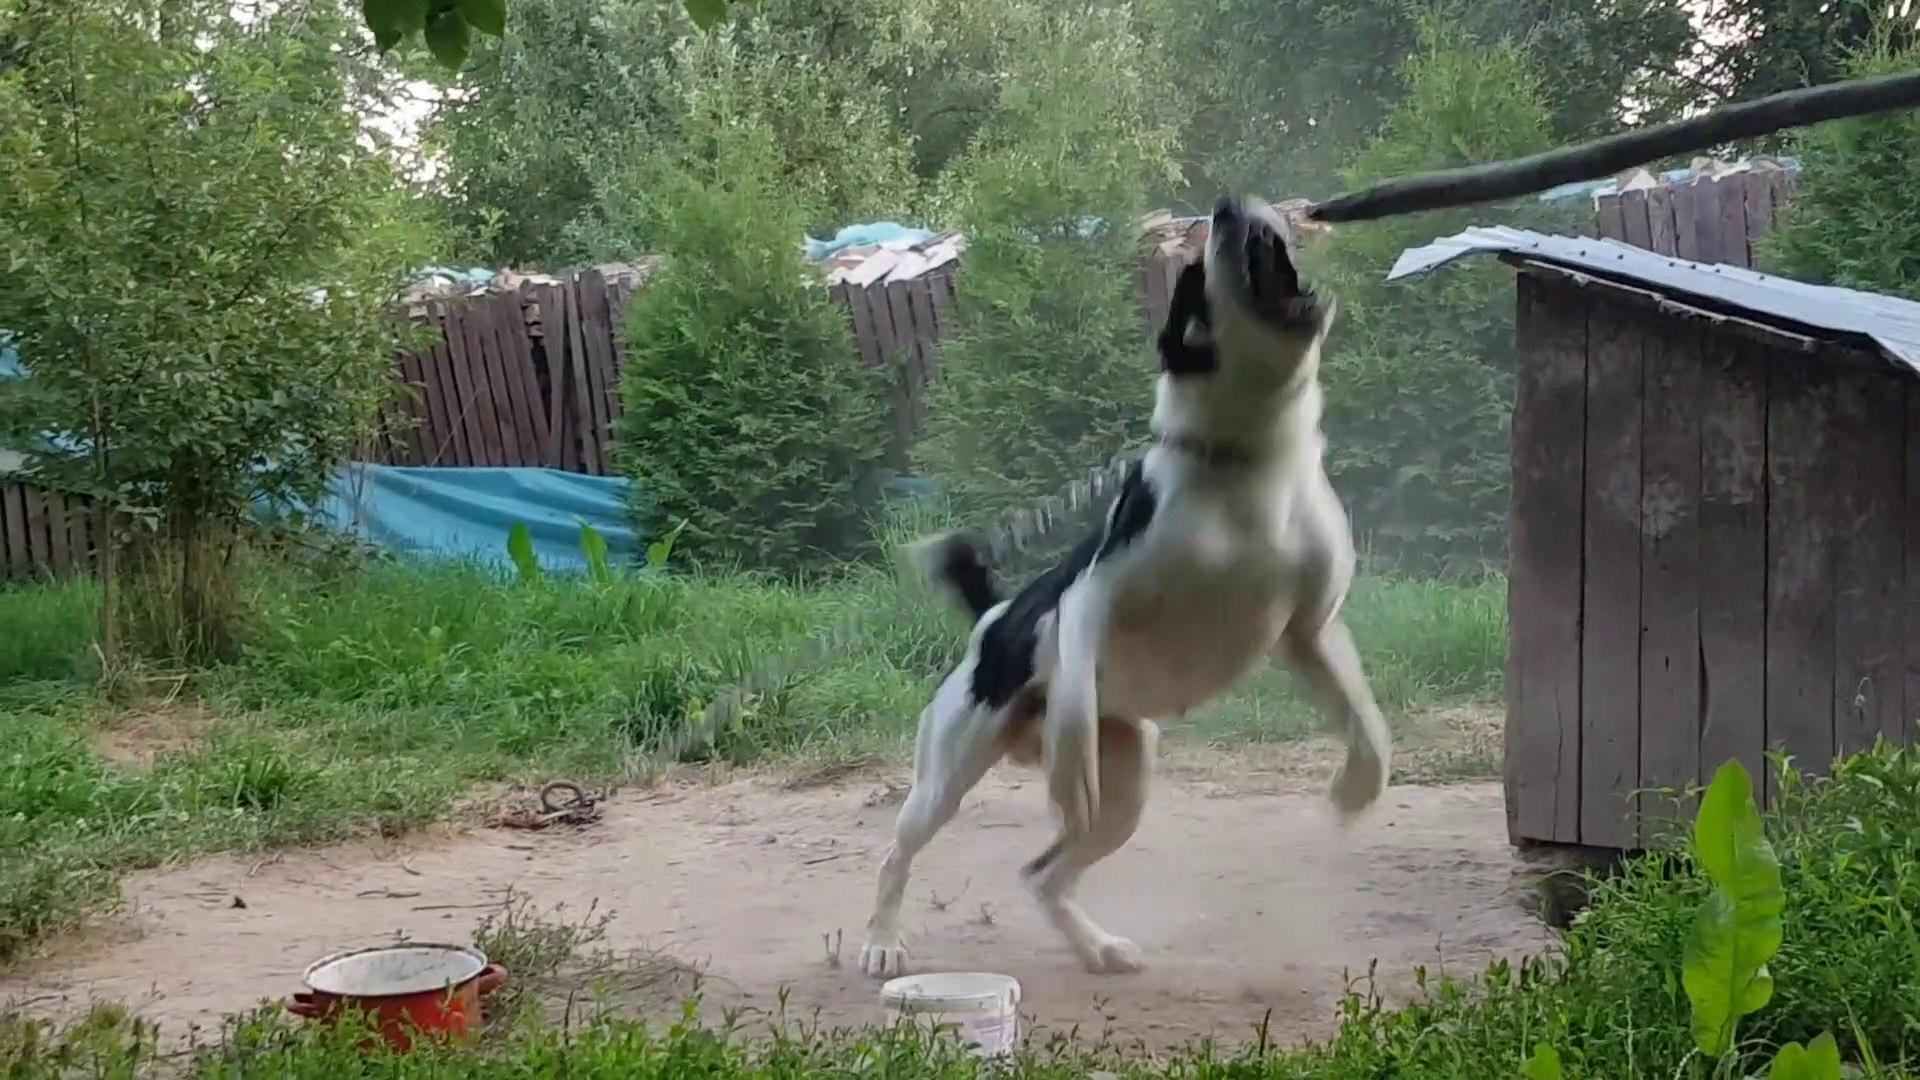 COK COK SERT ADAMCI ALABAY SOPAYI KIRIYOR - VERY VERY ANGRY ALABAi SHEPHERD DOG